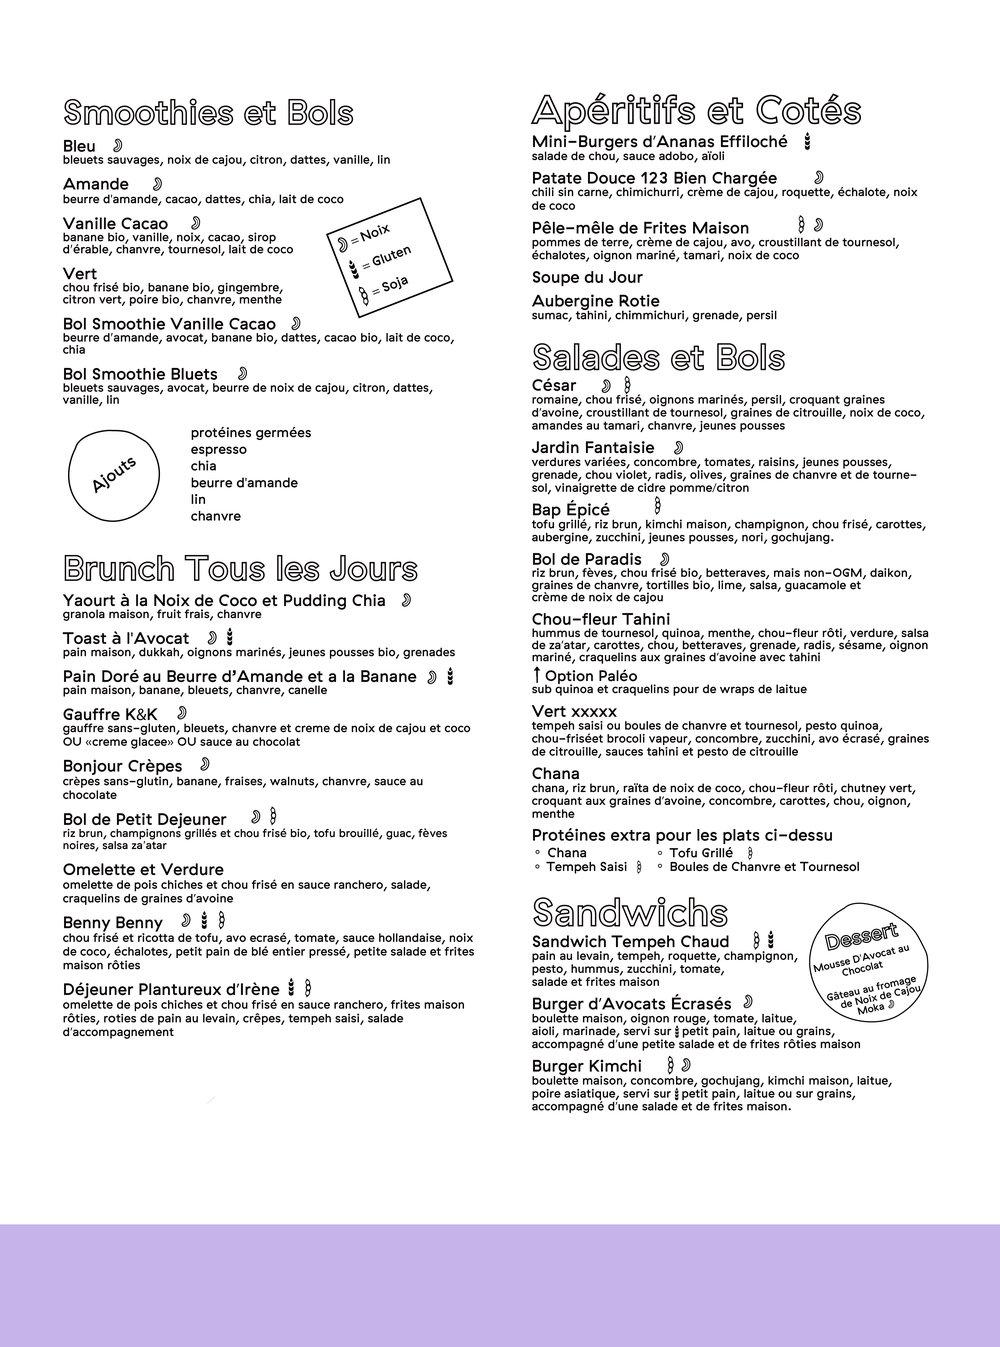 menu-fr-02.jpg